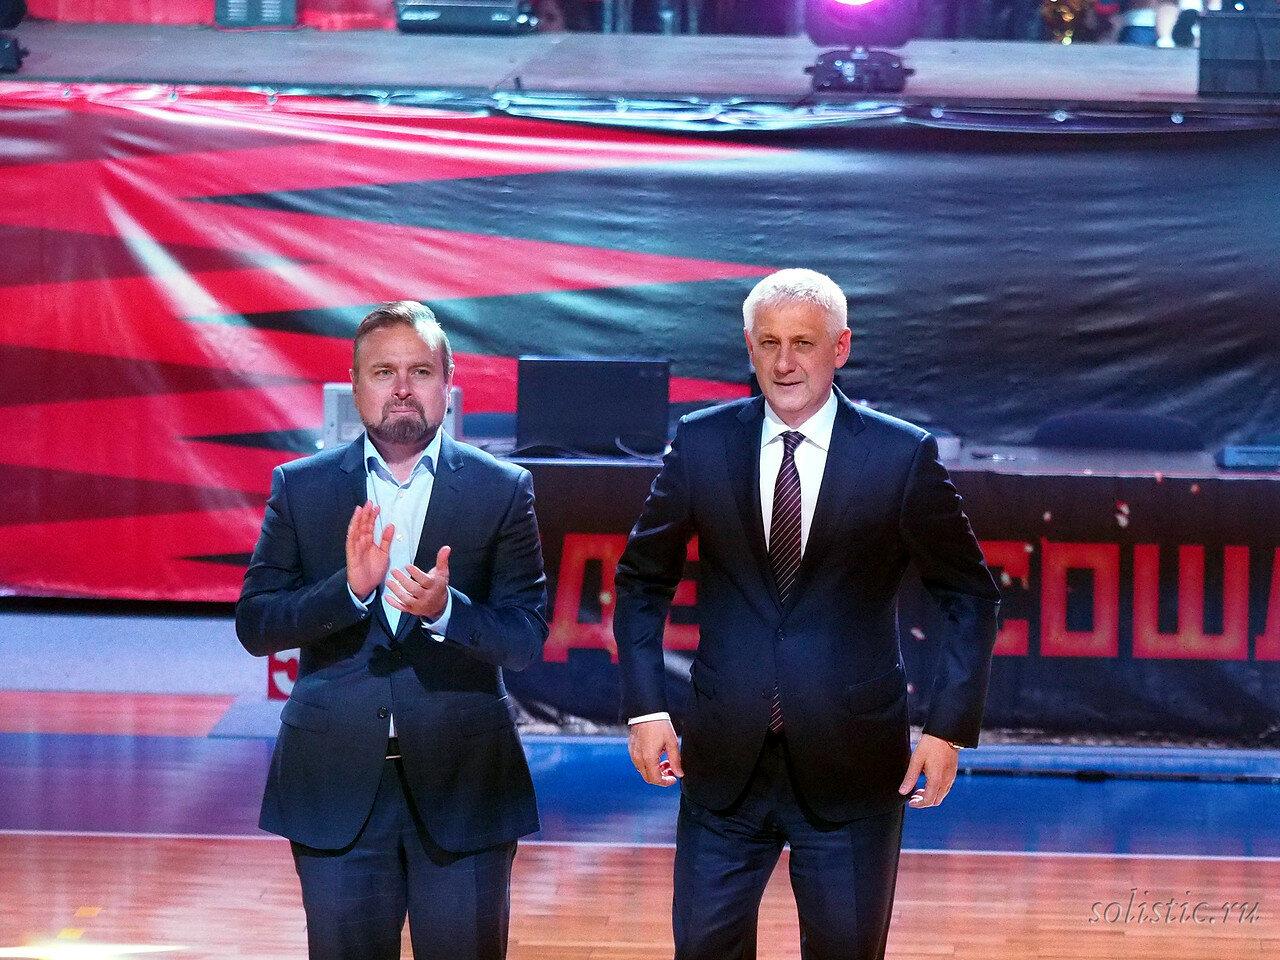 29 Матч звезд АСБ 2018 (ассоциации студенческого баскетбола)